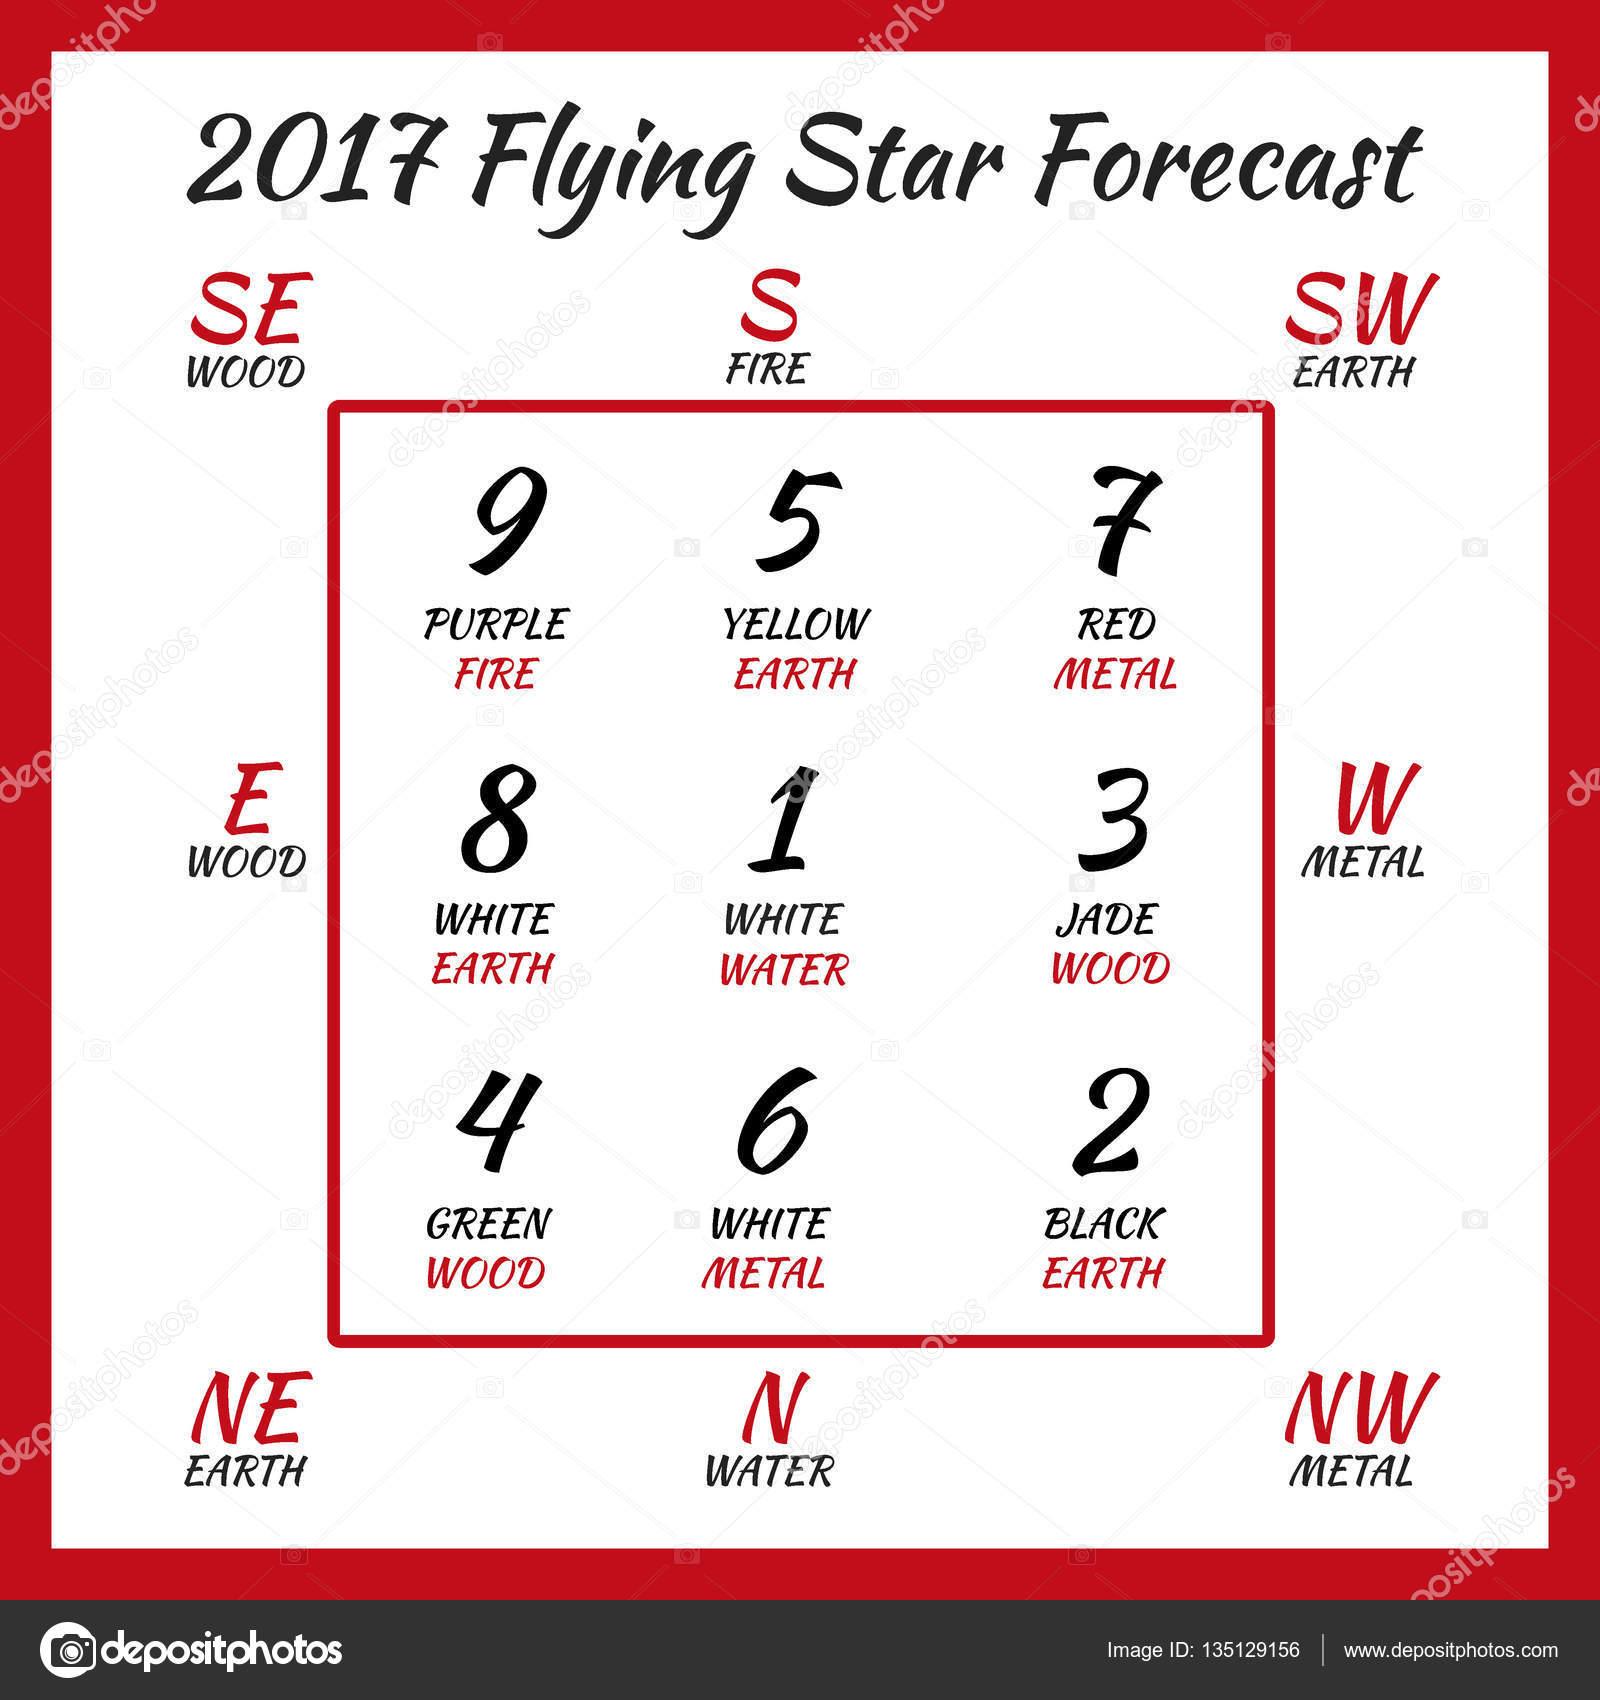 Fliegende Sterne Prognose 2017 — Stockvektor © FireHourse #135129156